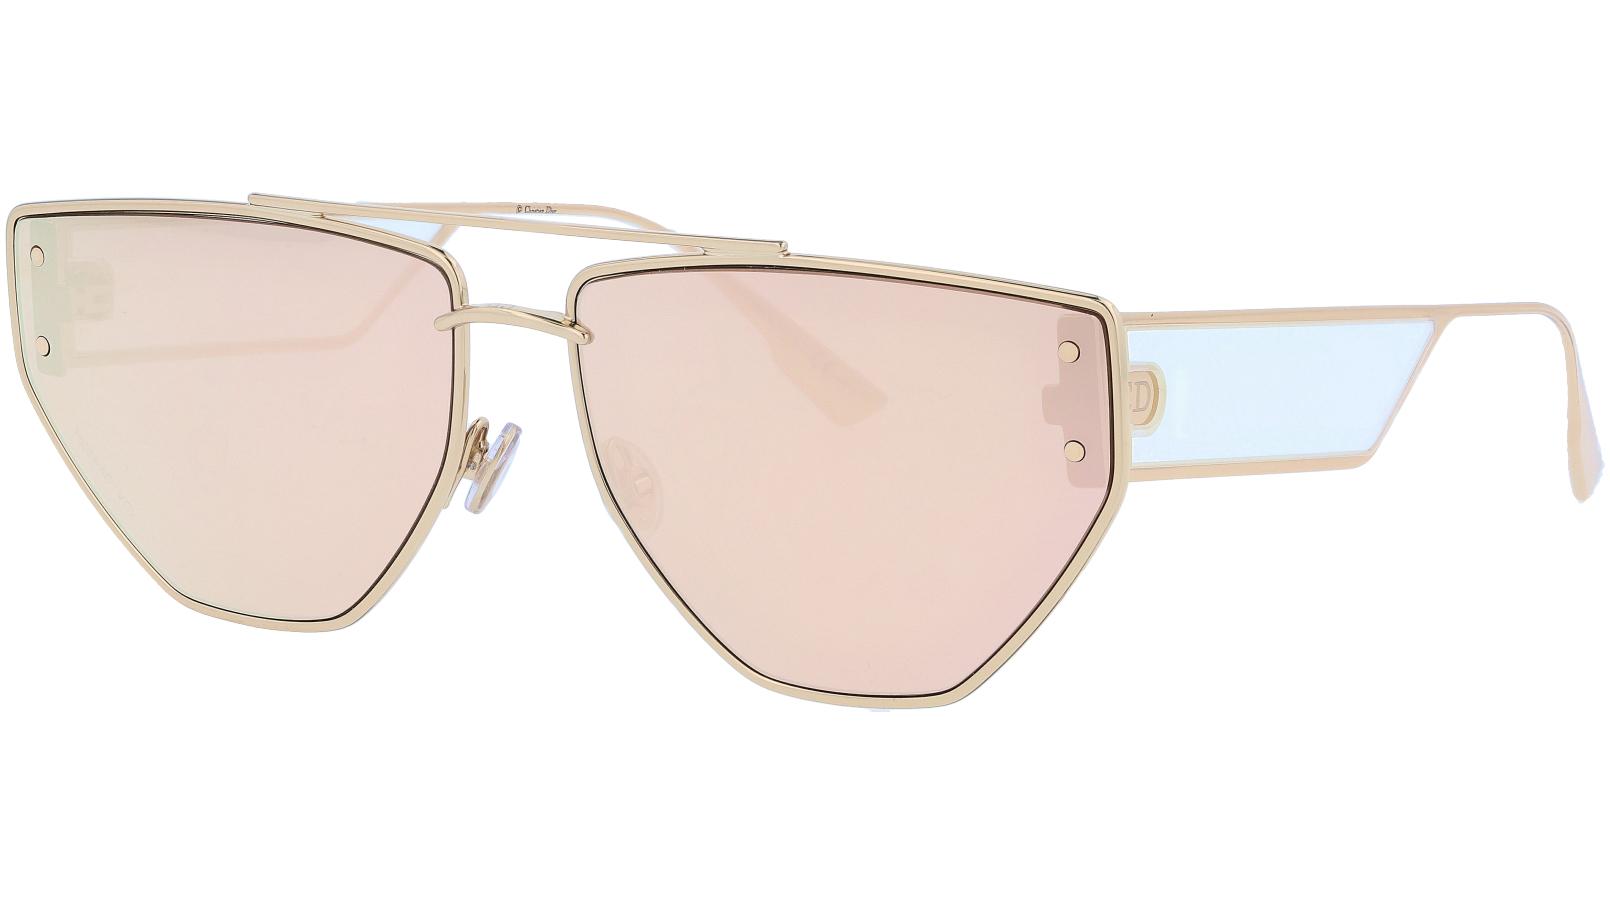 Dior CLAN2 DDB1I 61 Gold Sunglasses